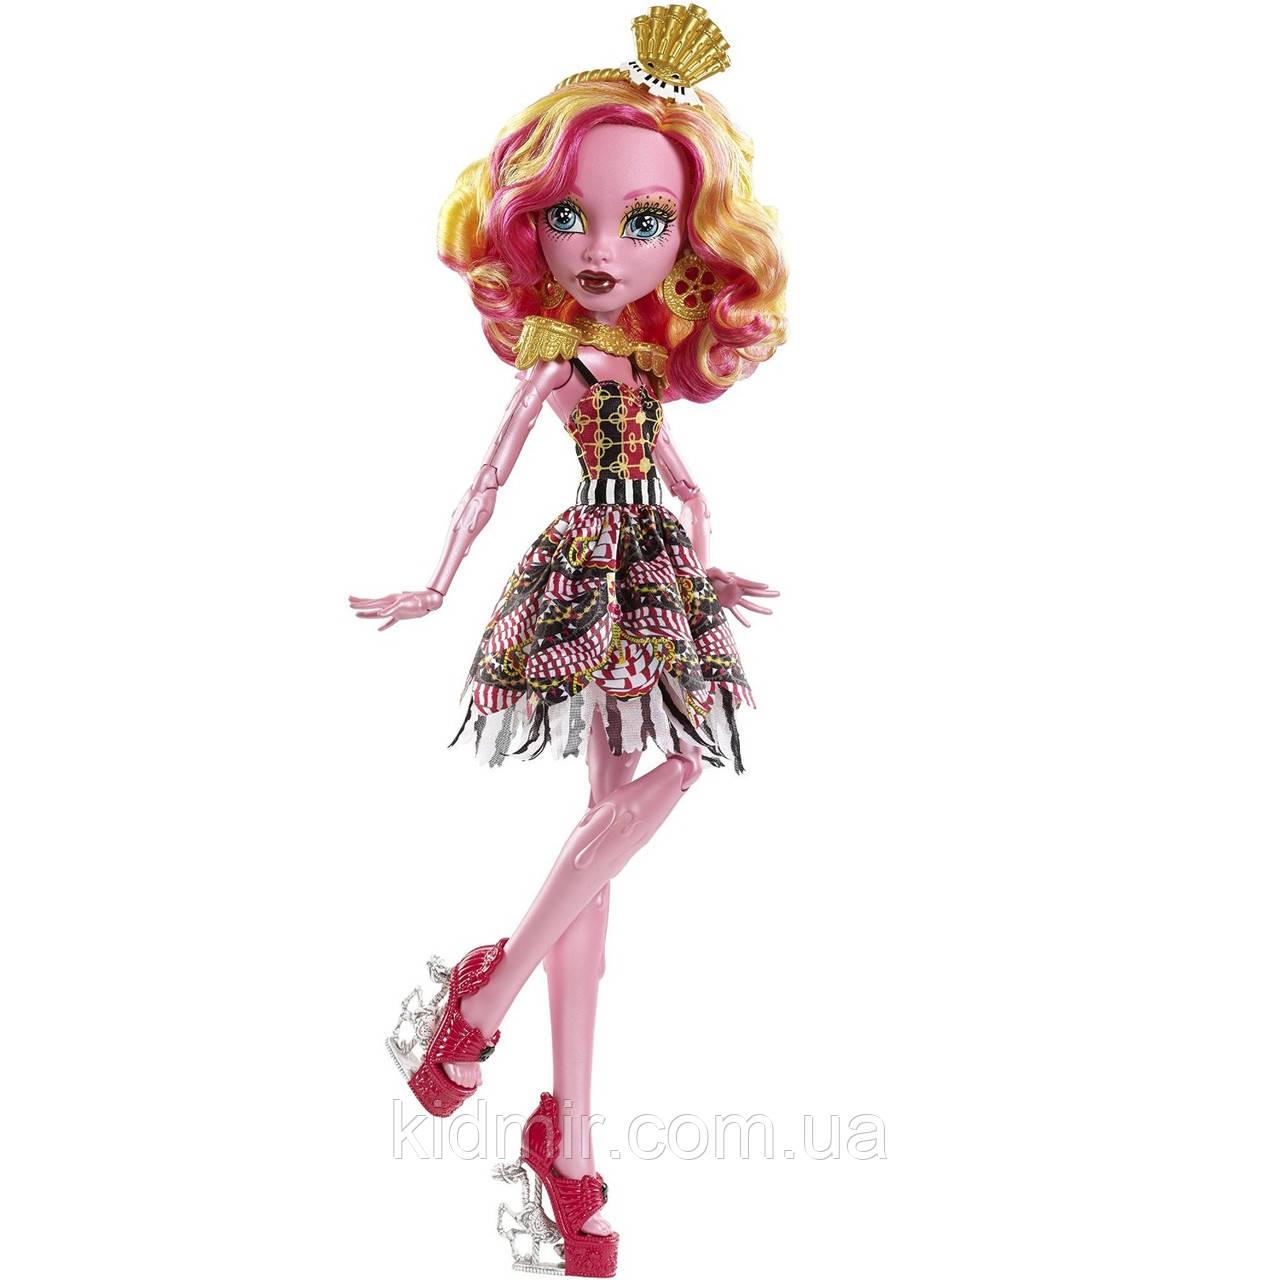 Кукла Гулиопа Джеллингтон Monster High Gooliope Jellington Freak du Chic Монстр Хай